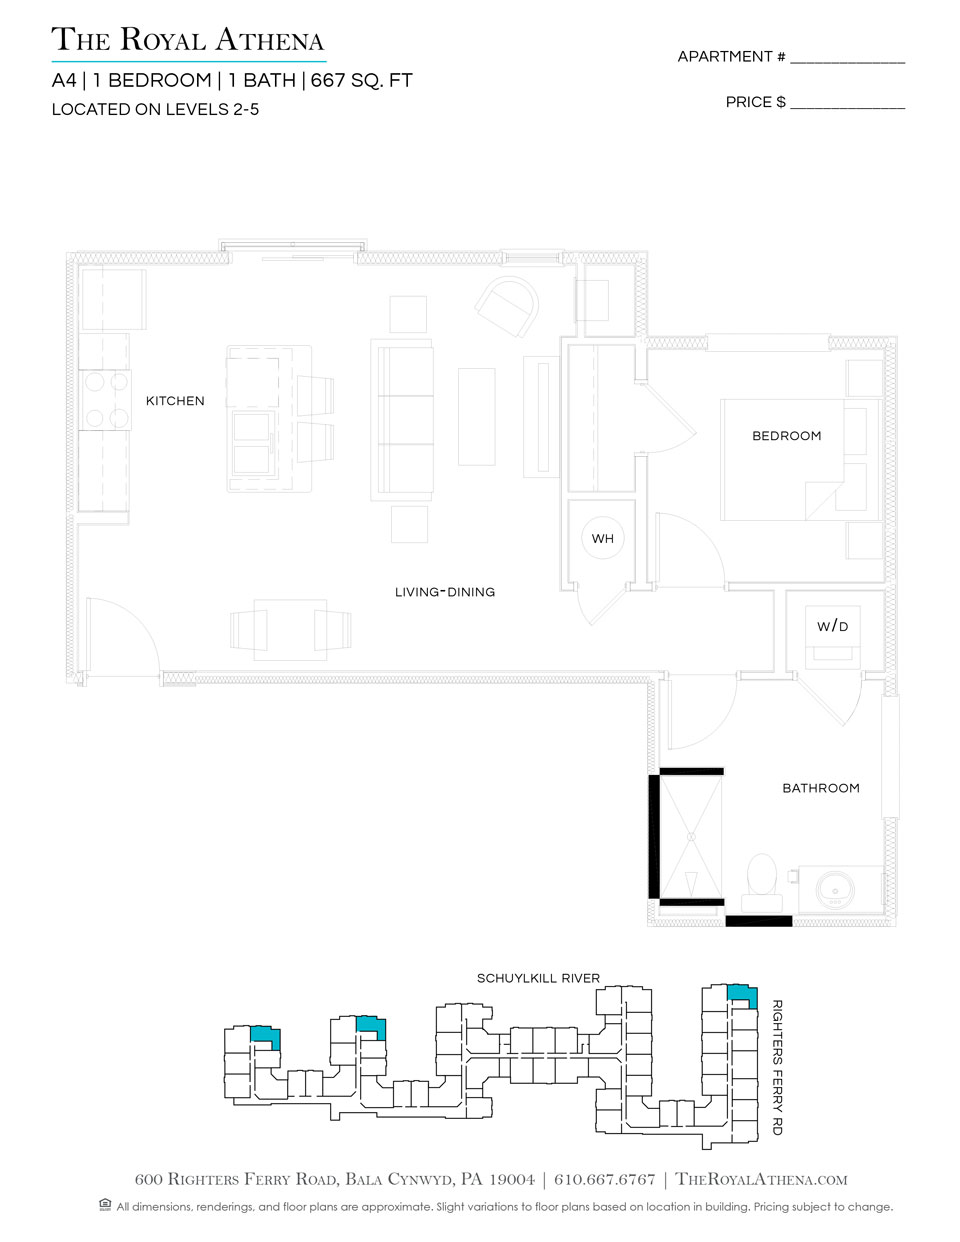 P0659218 a4 2 floorplan